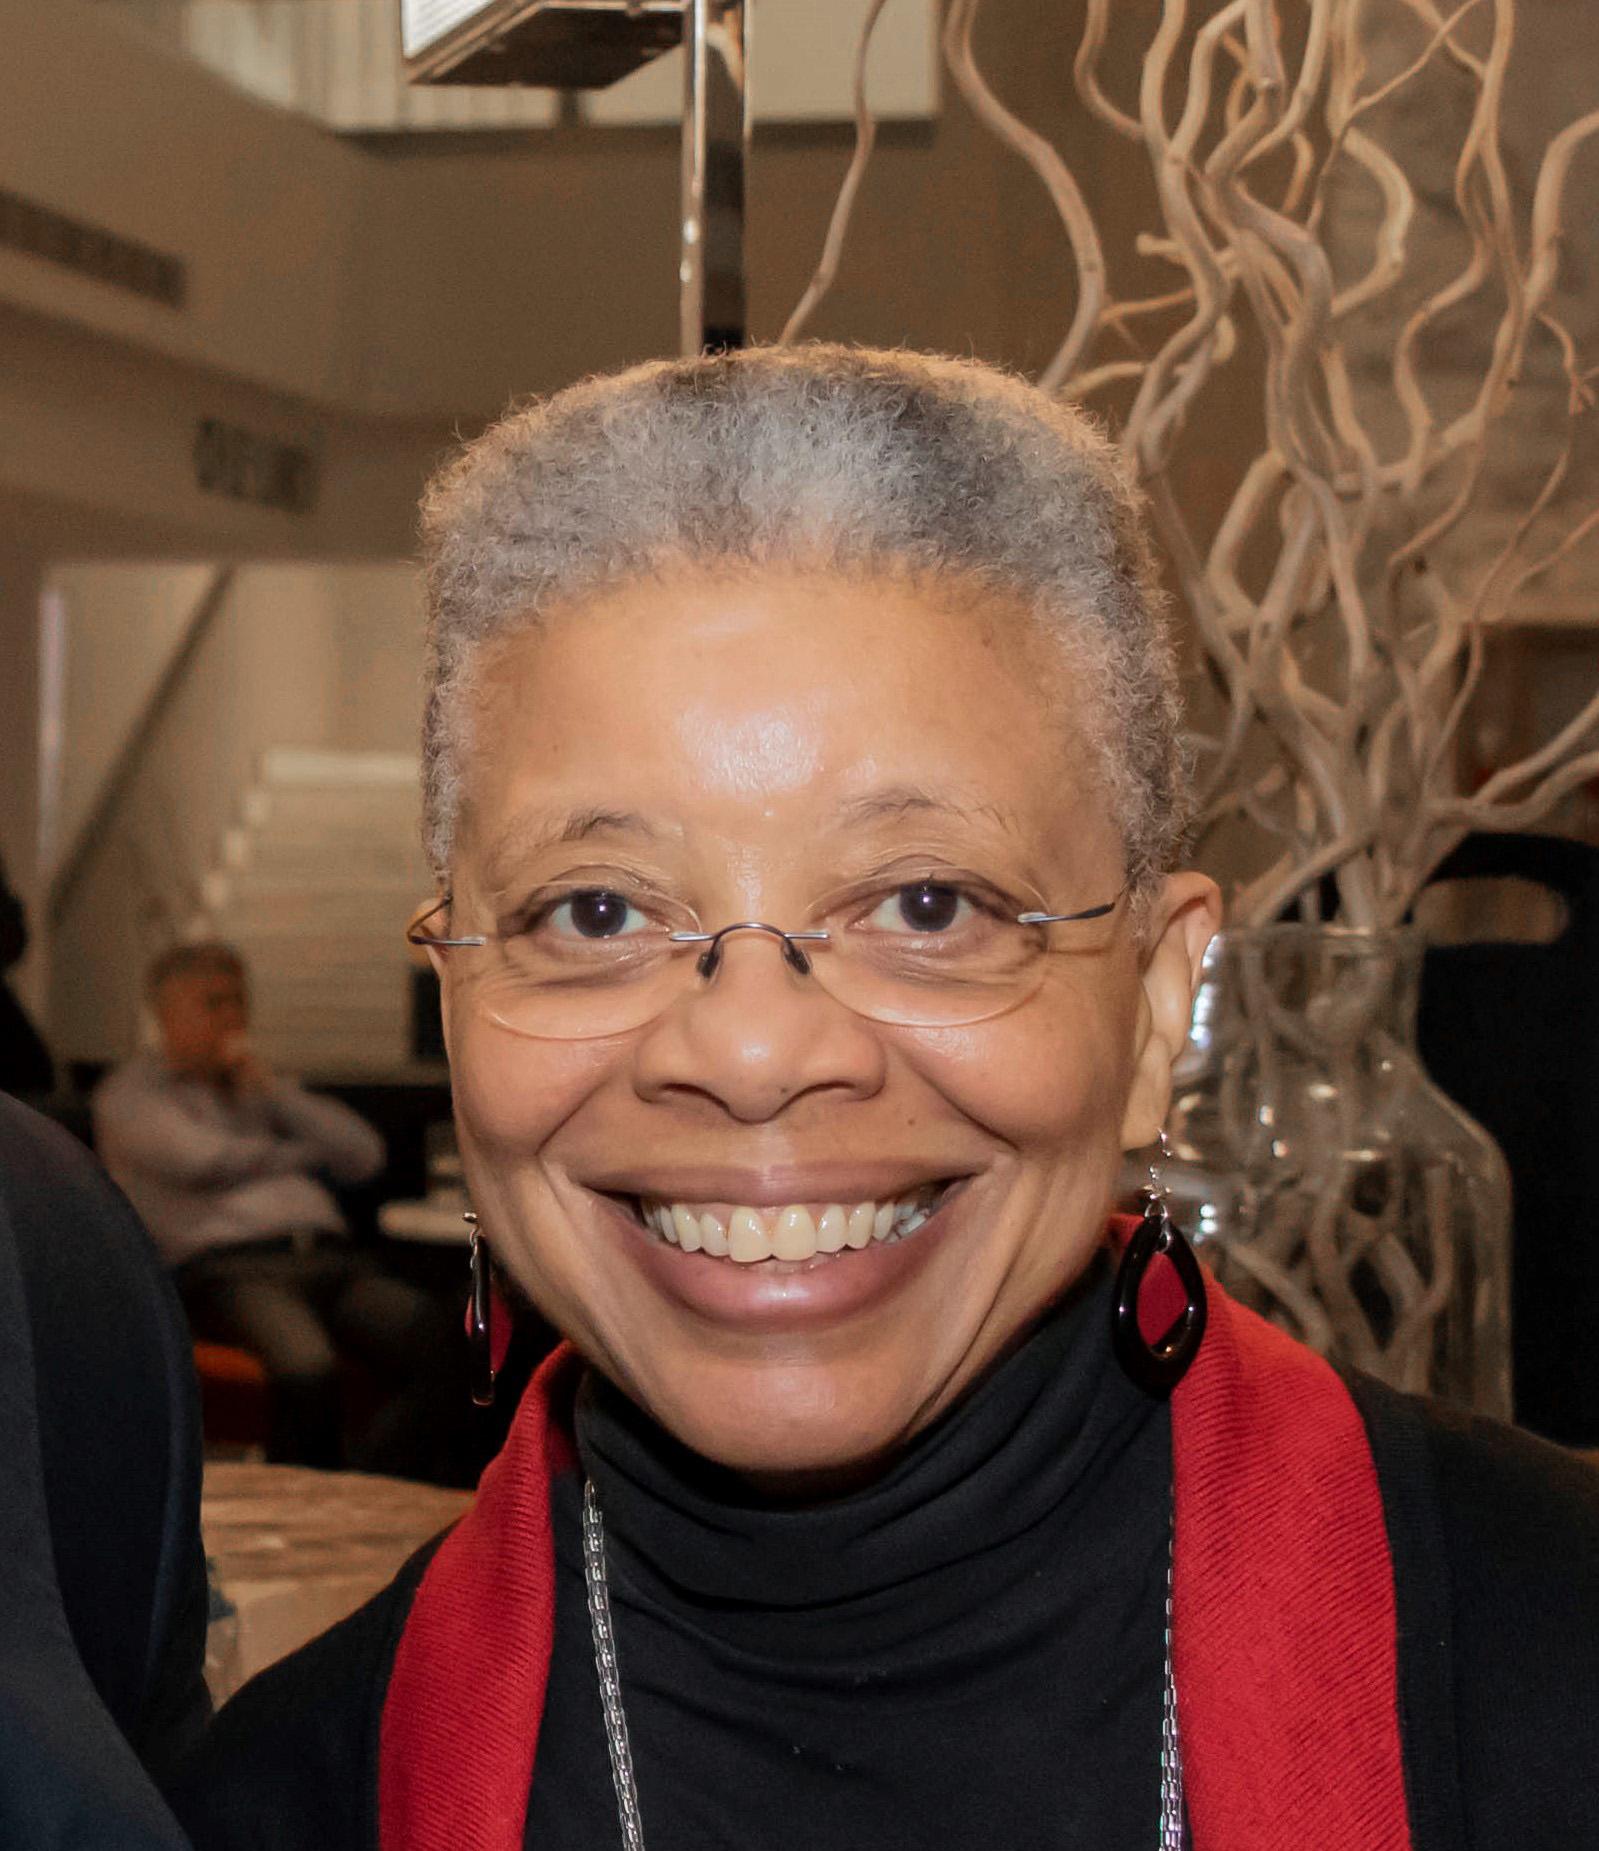 Monique Y. Wells